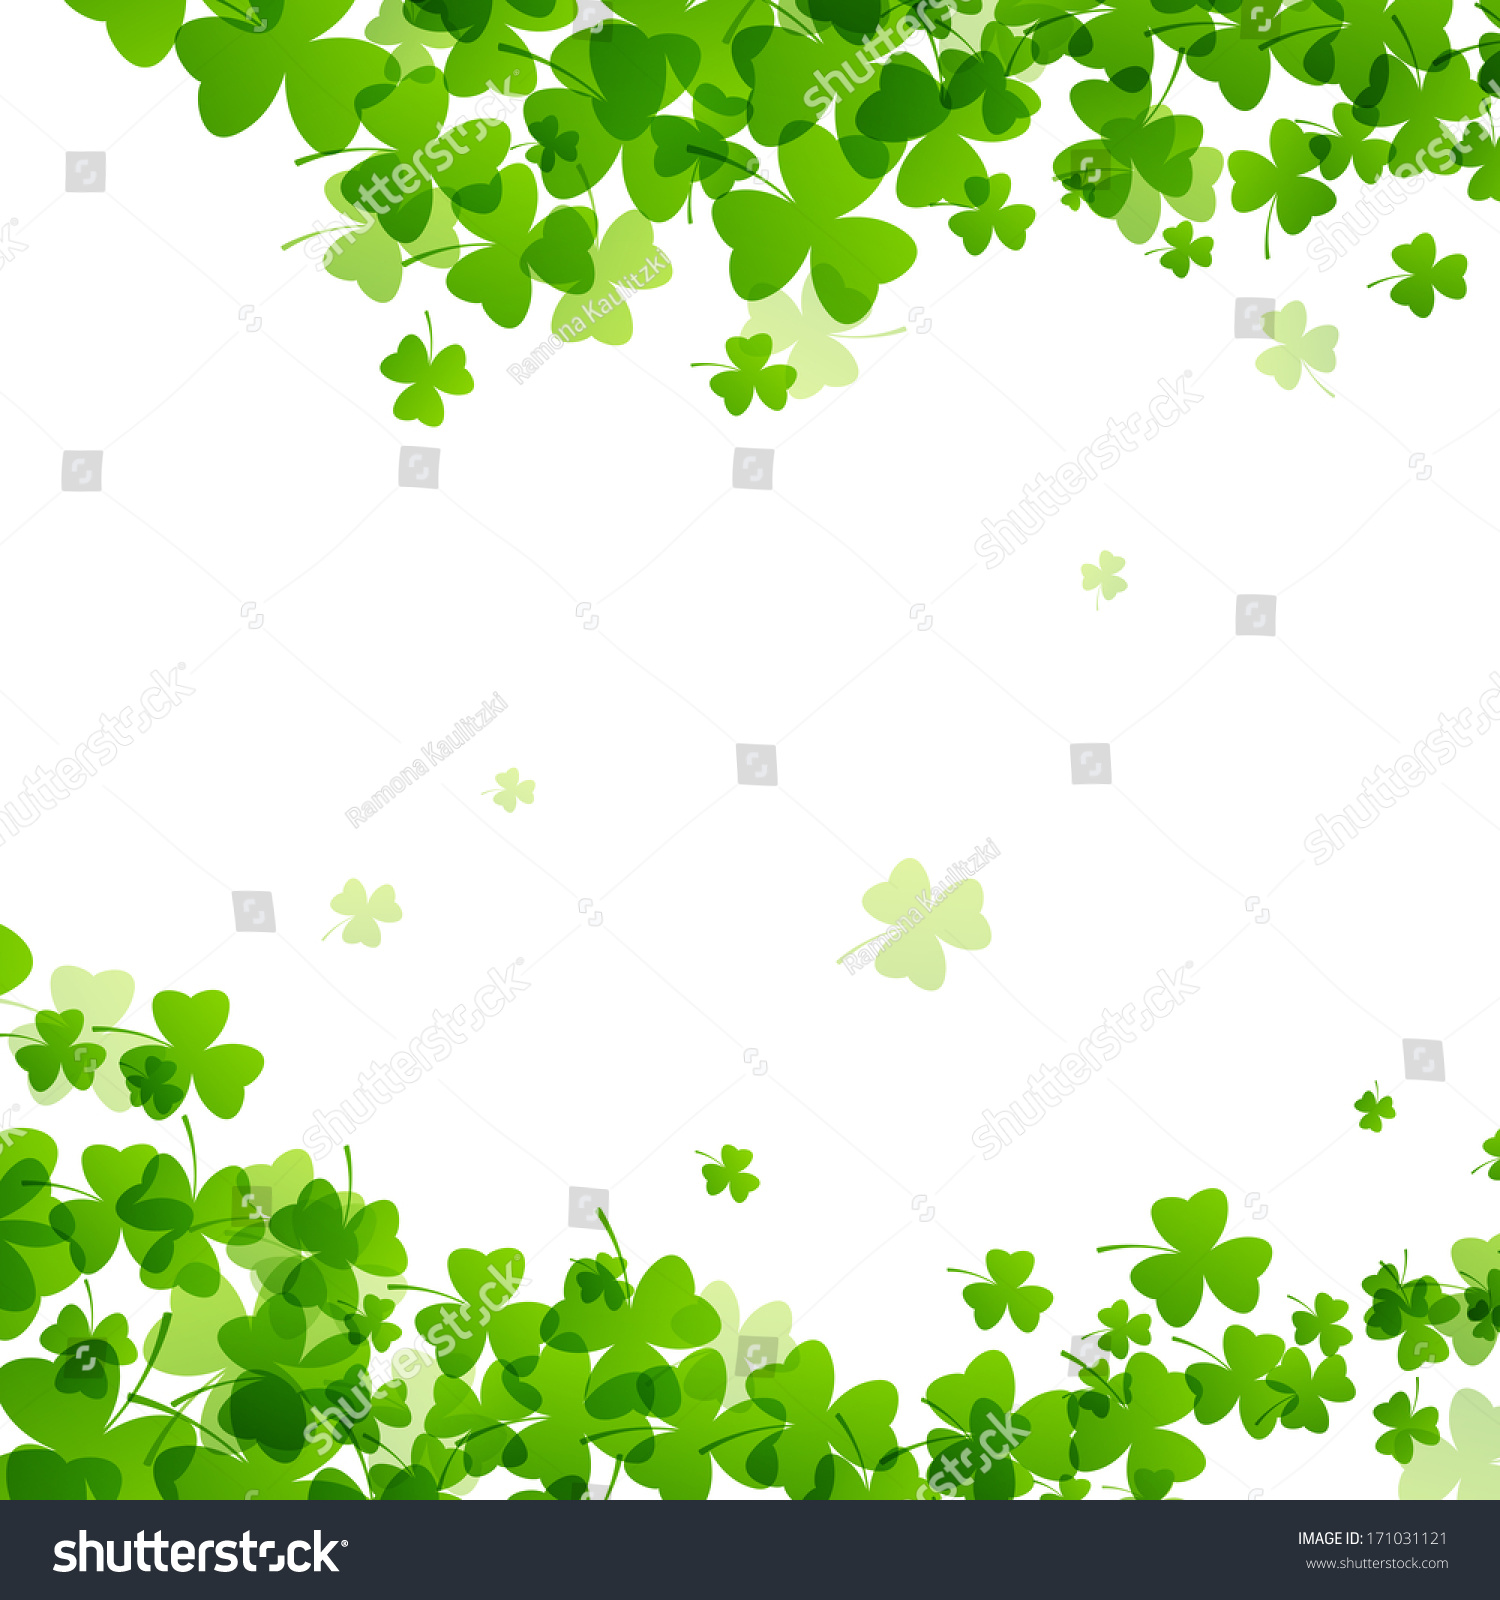 Vector Illustration St Patricks Day Background Stock 1500x1600